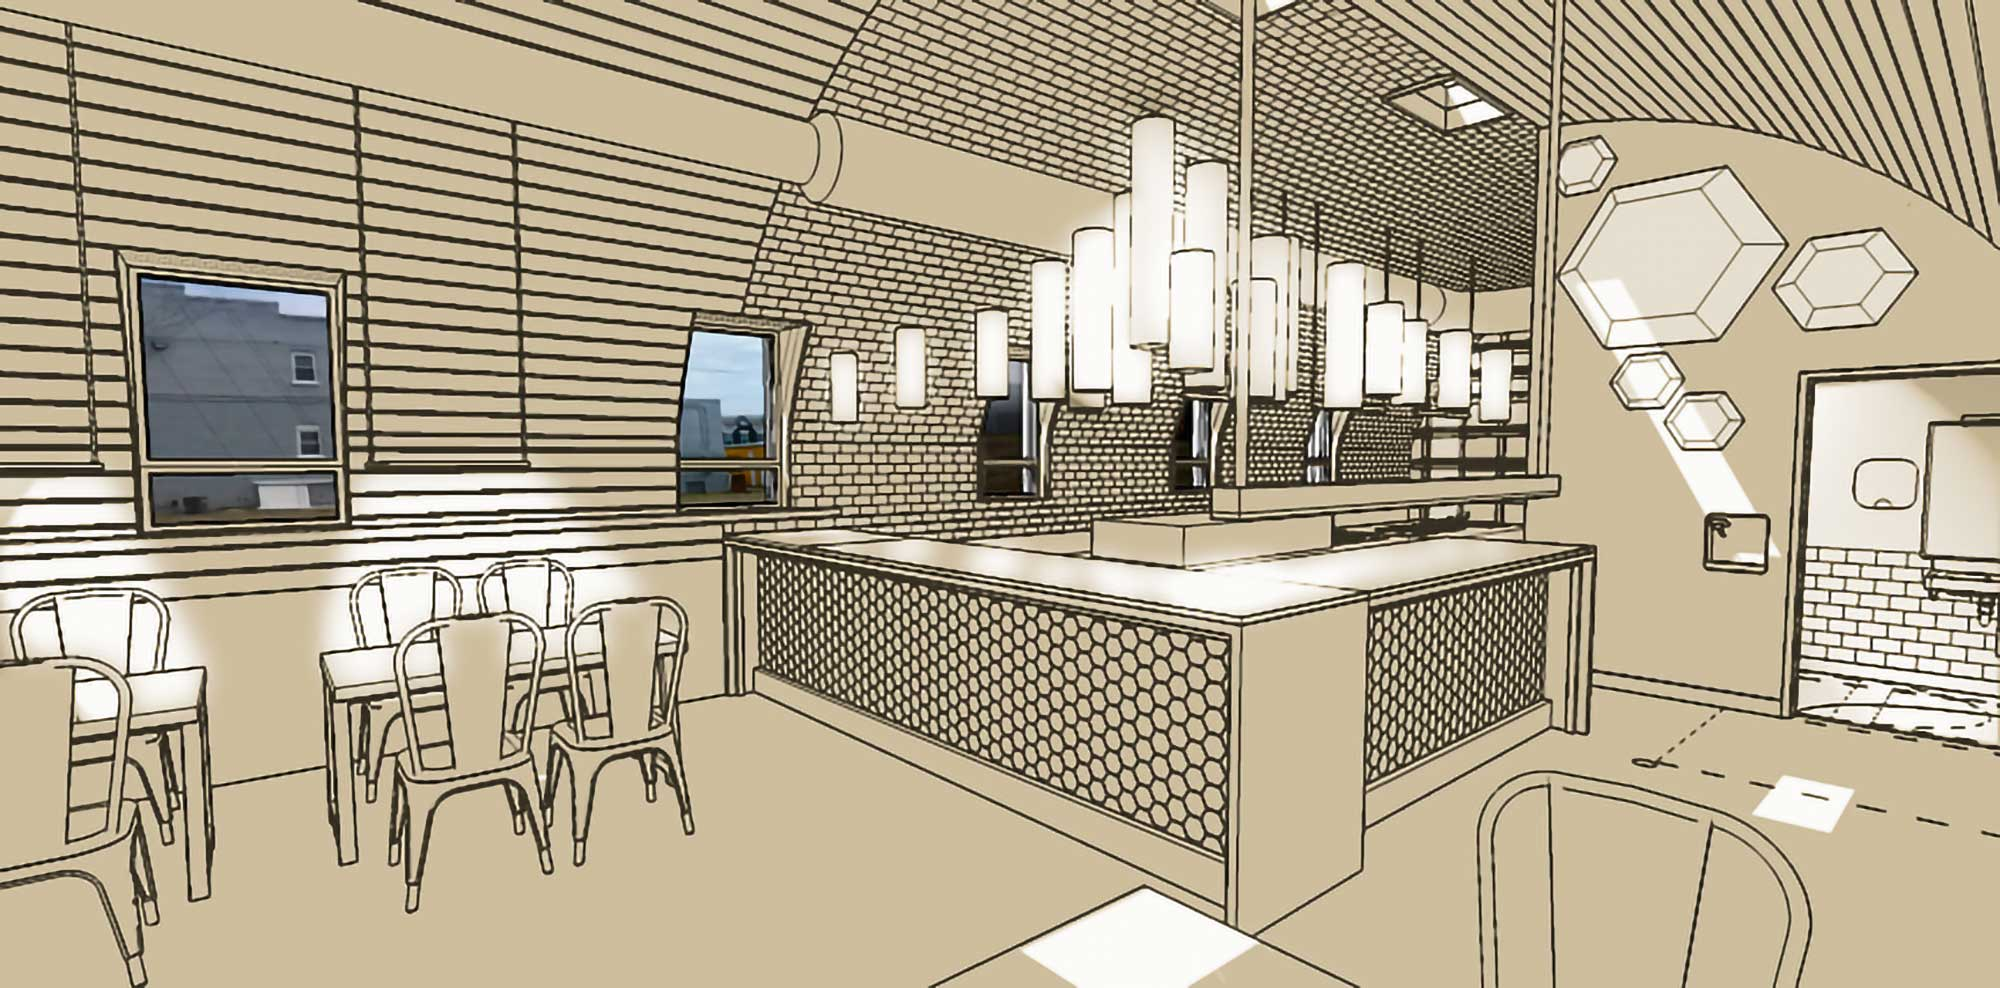 Restaurant Interior counter rendering